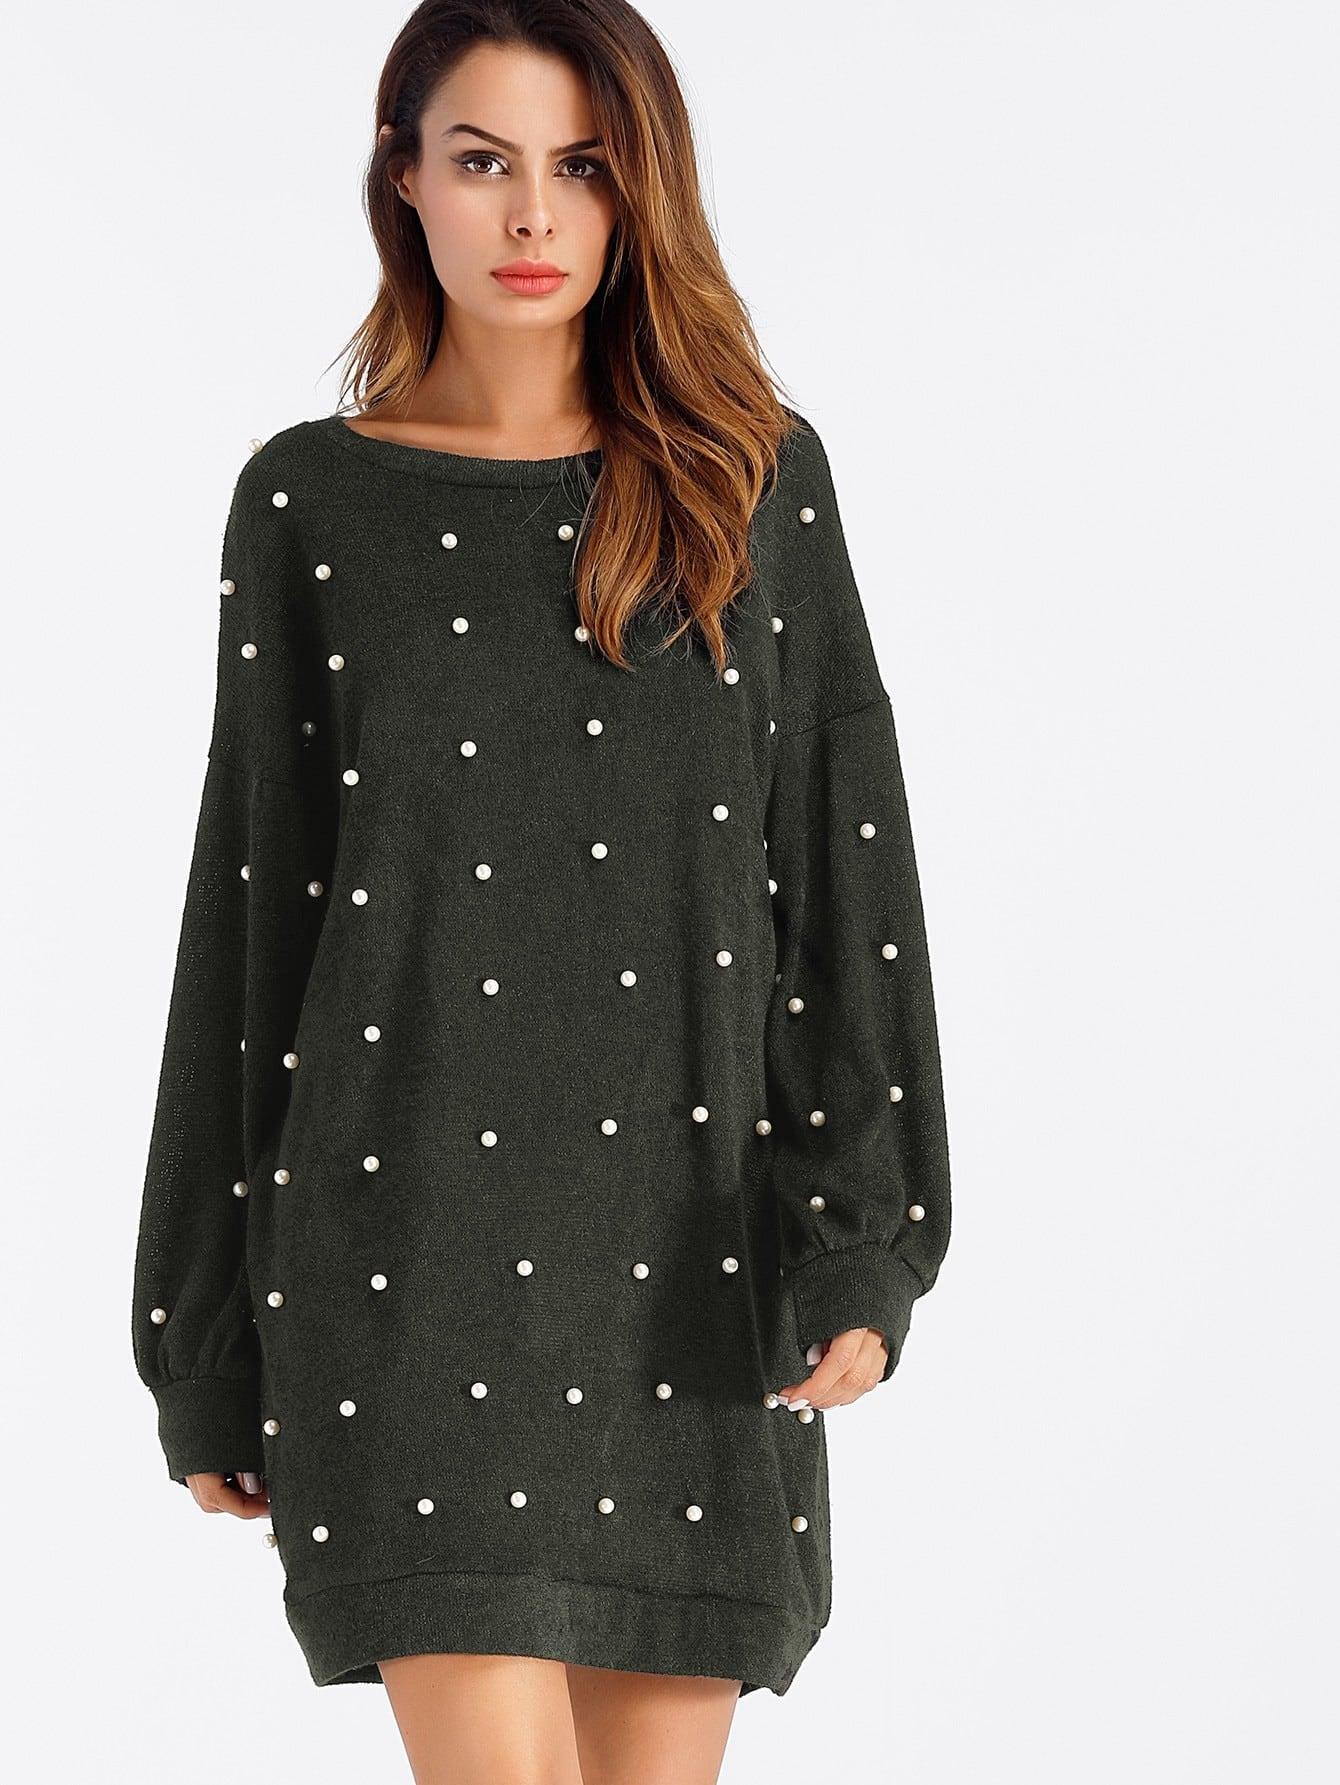 Pearl Beaded Drop Shoulder Sweater Dress faux pearl drop shoulder dress